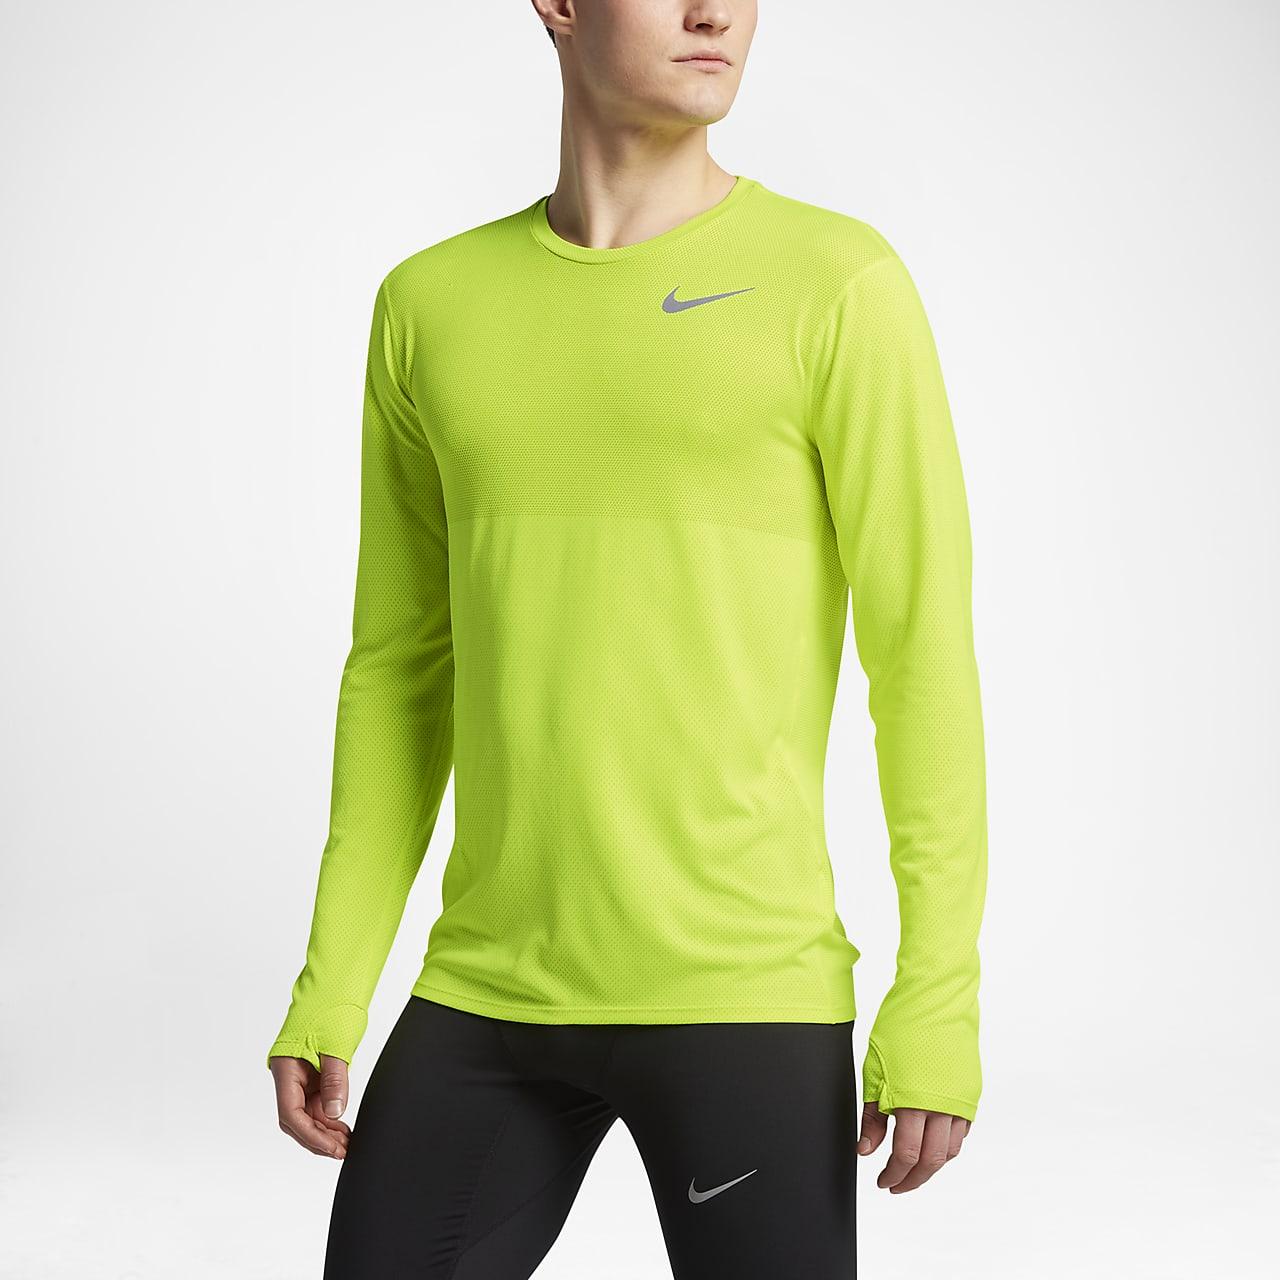 Nike Zonal Cooling Relay Men's Long-Sleeve Running Top